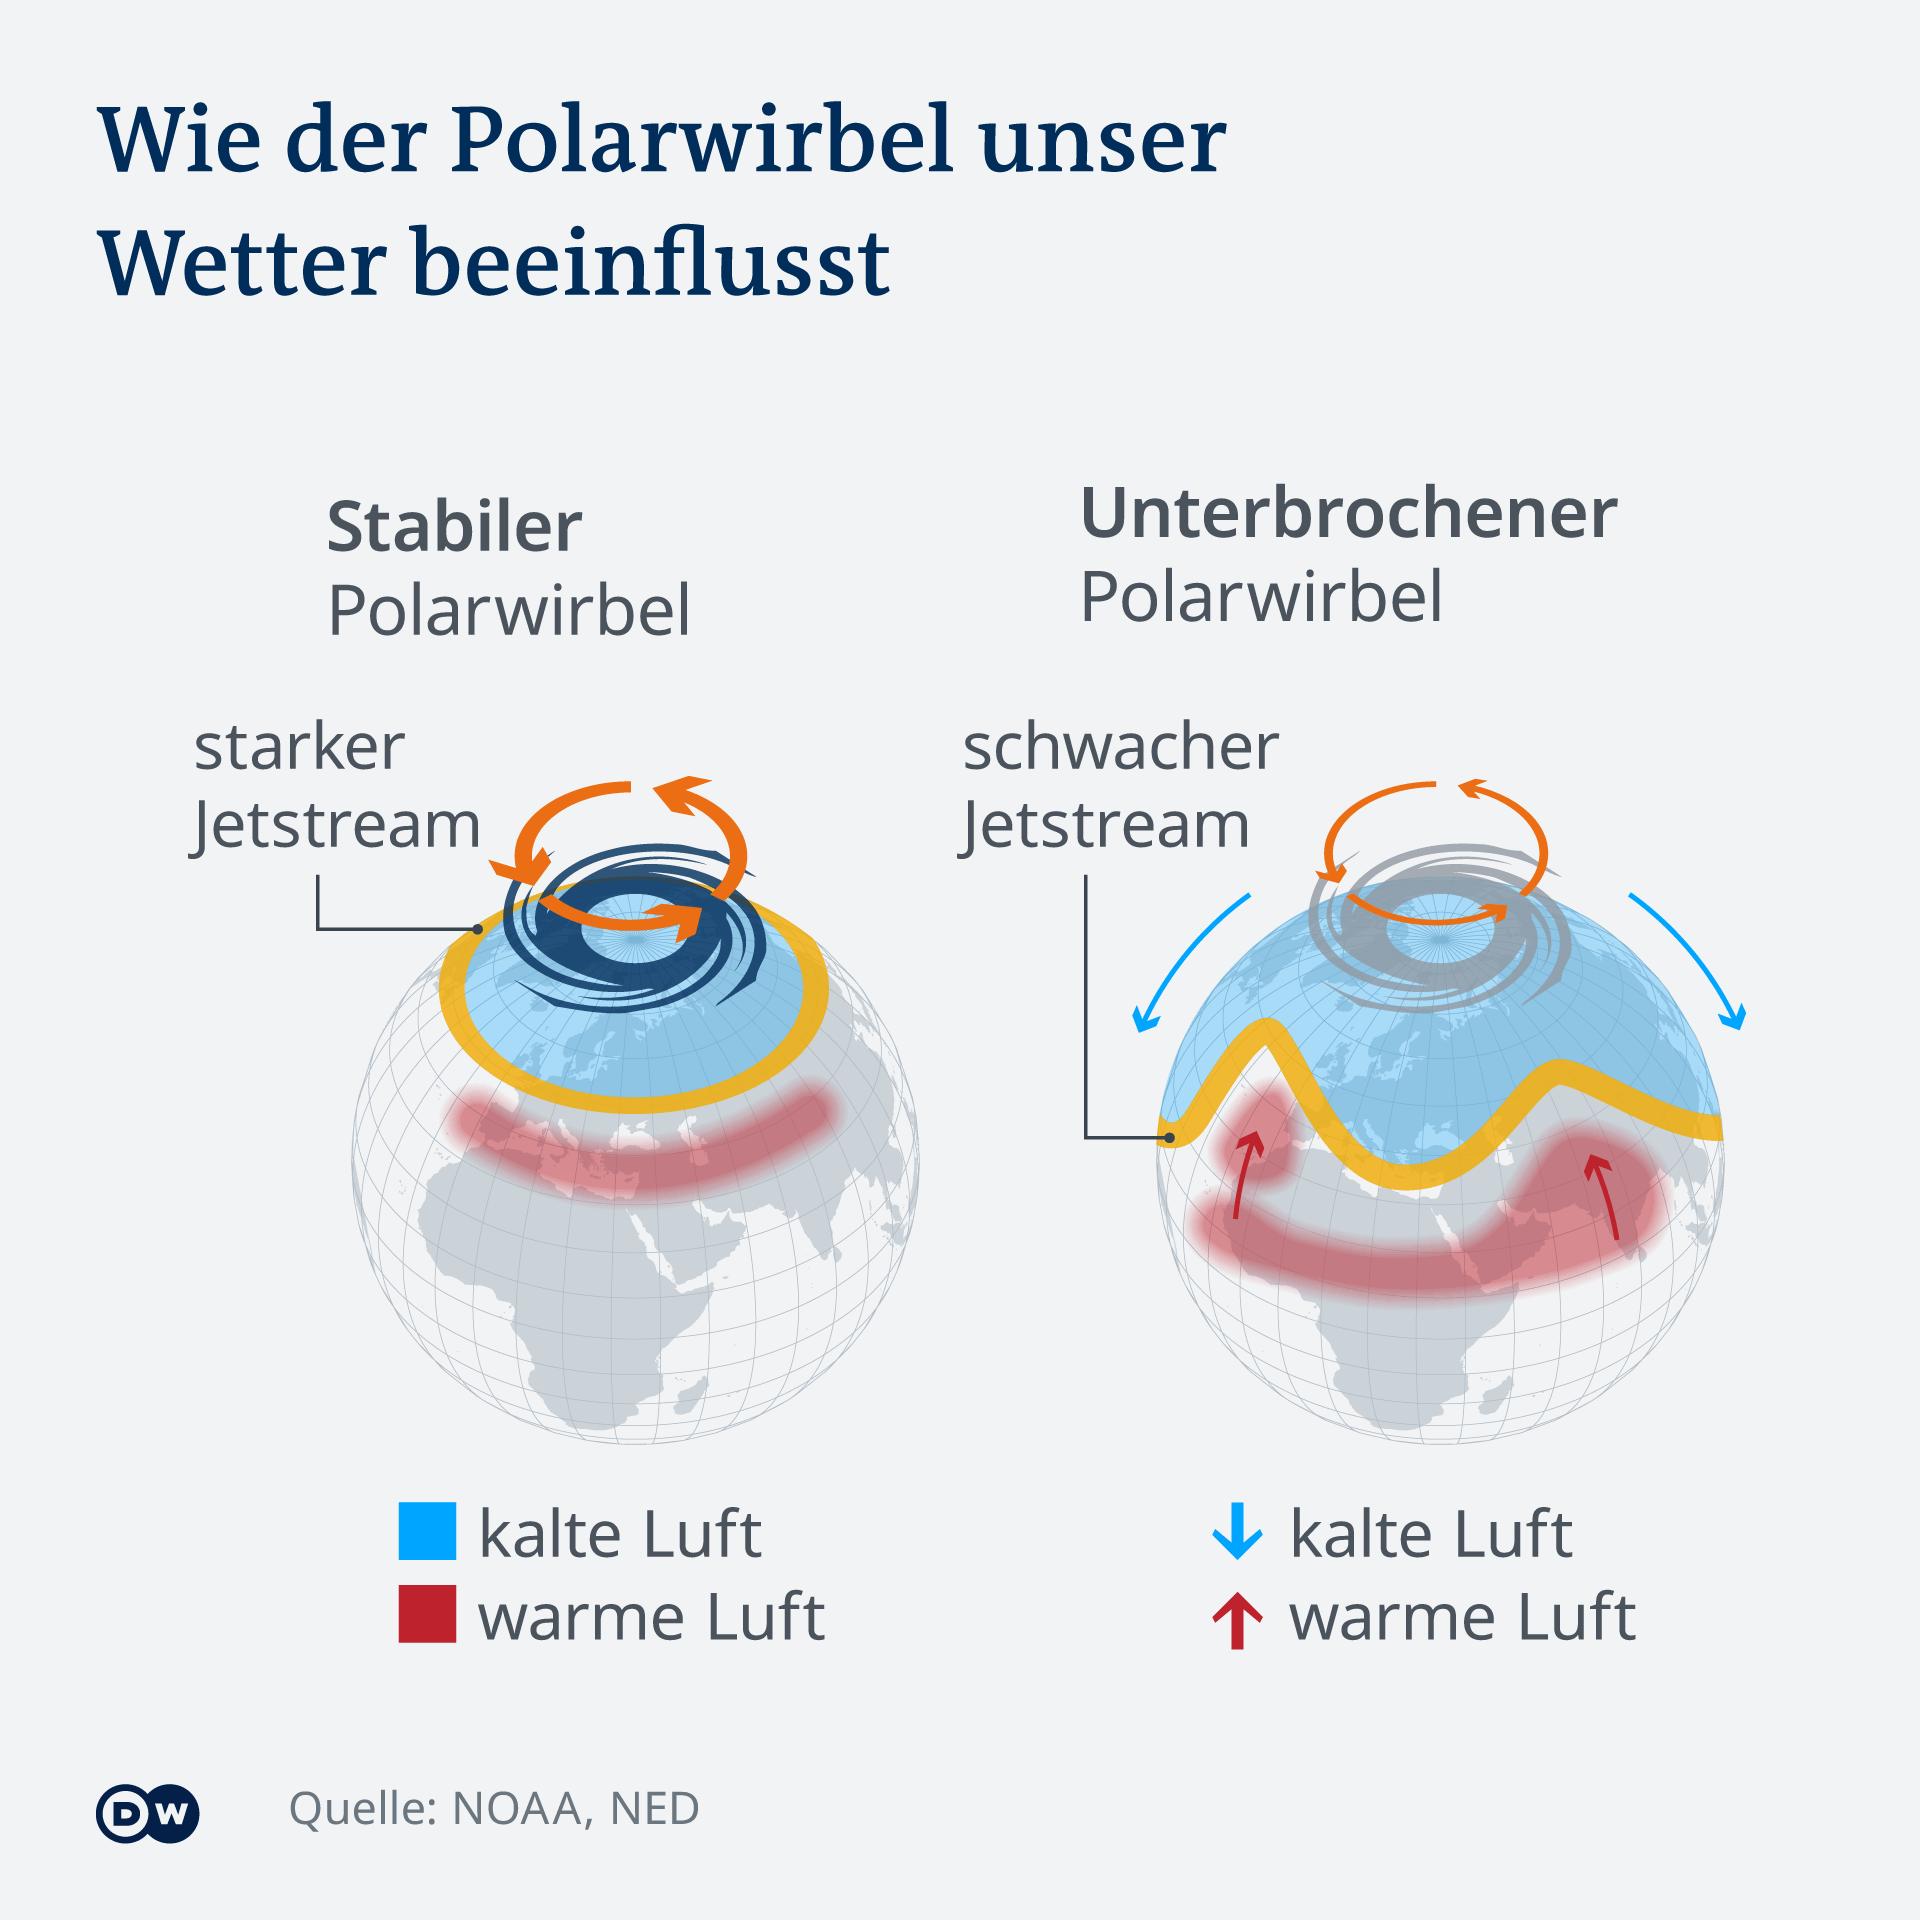 Infografik - Wie der Polarwirbel unser Wetter beeinflusst - DE